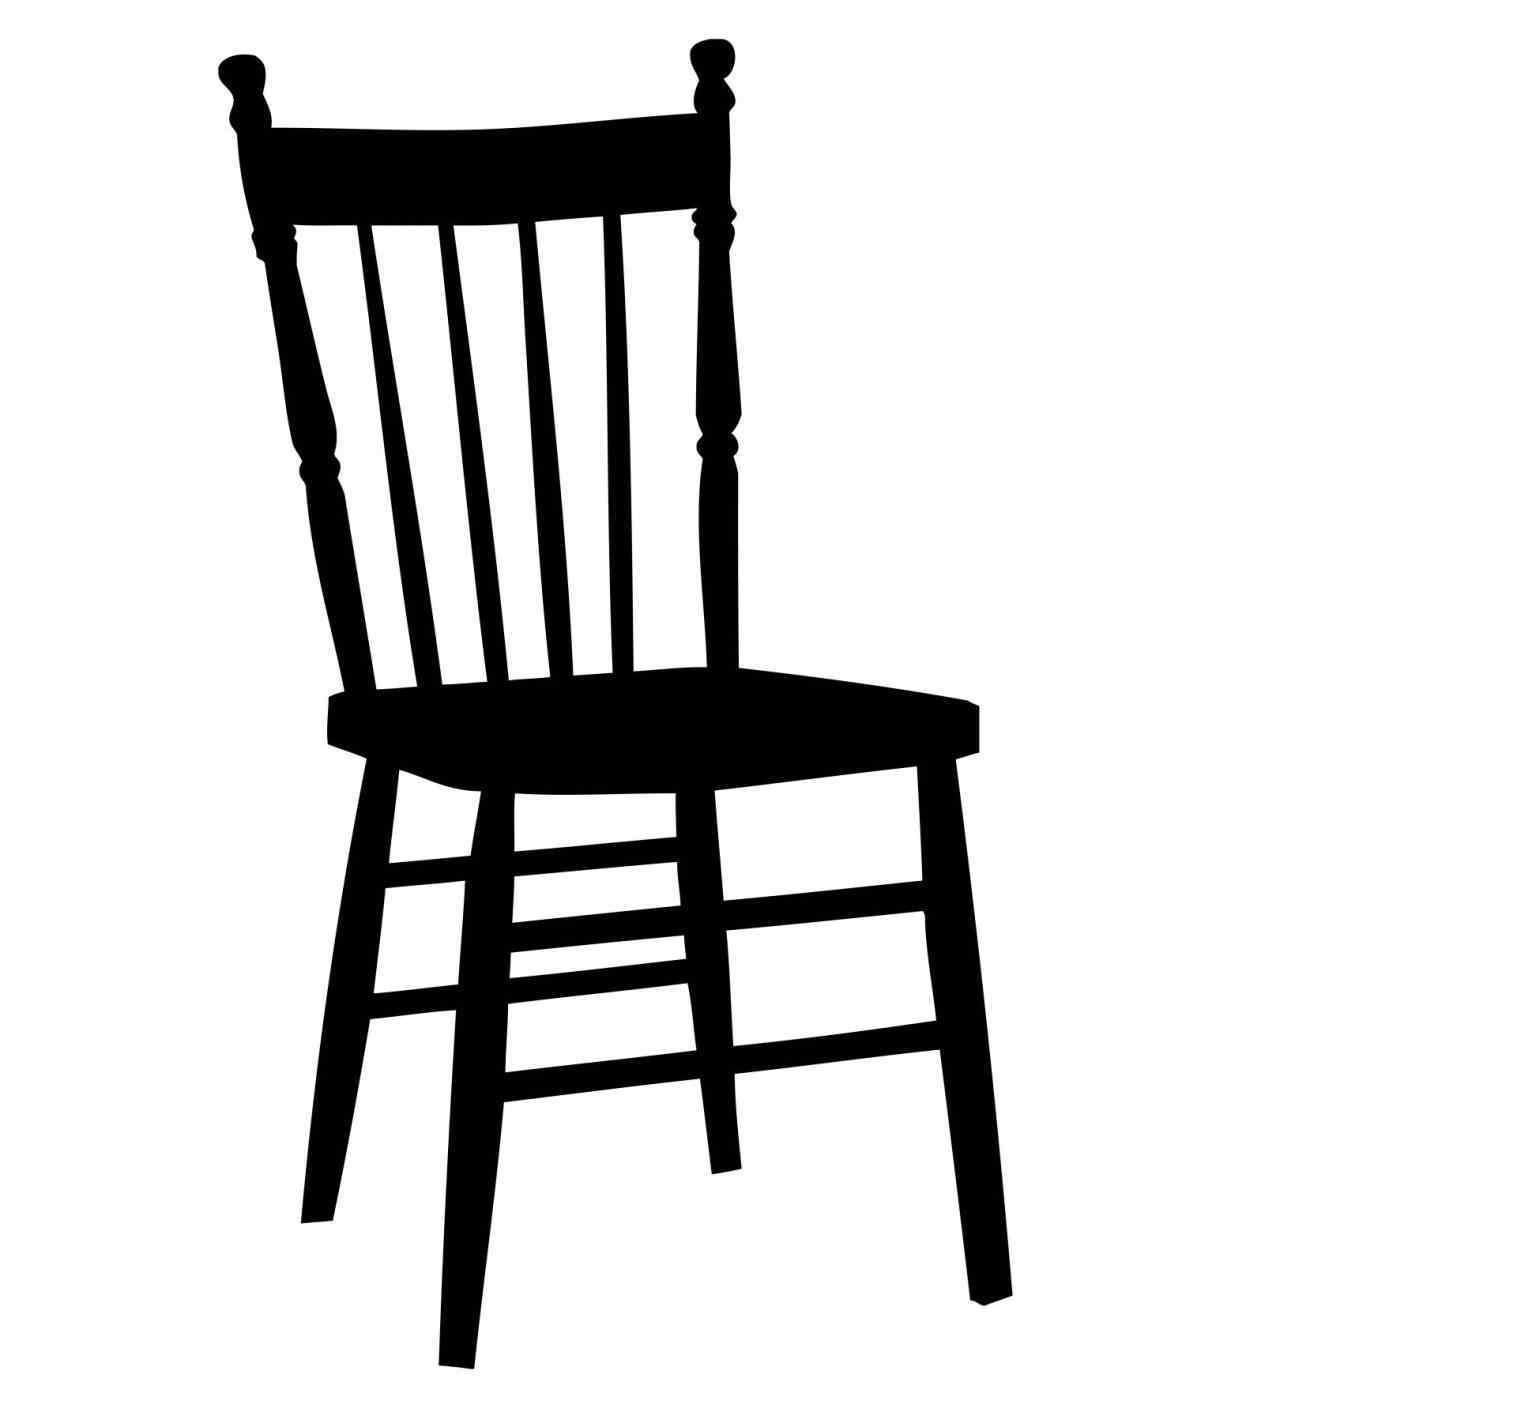 1517x1408 Rocking Chair Silhouette